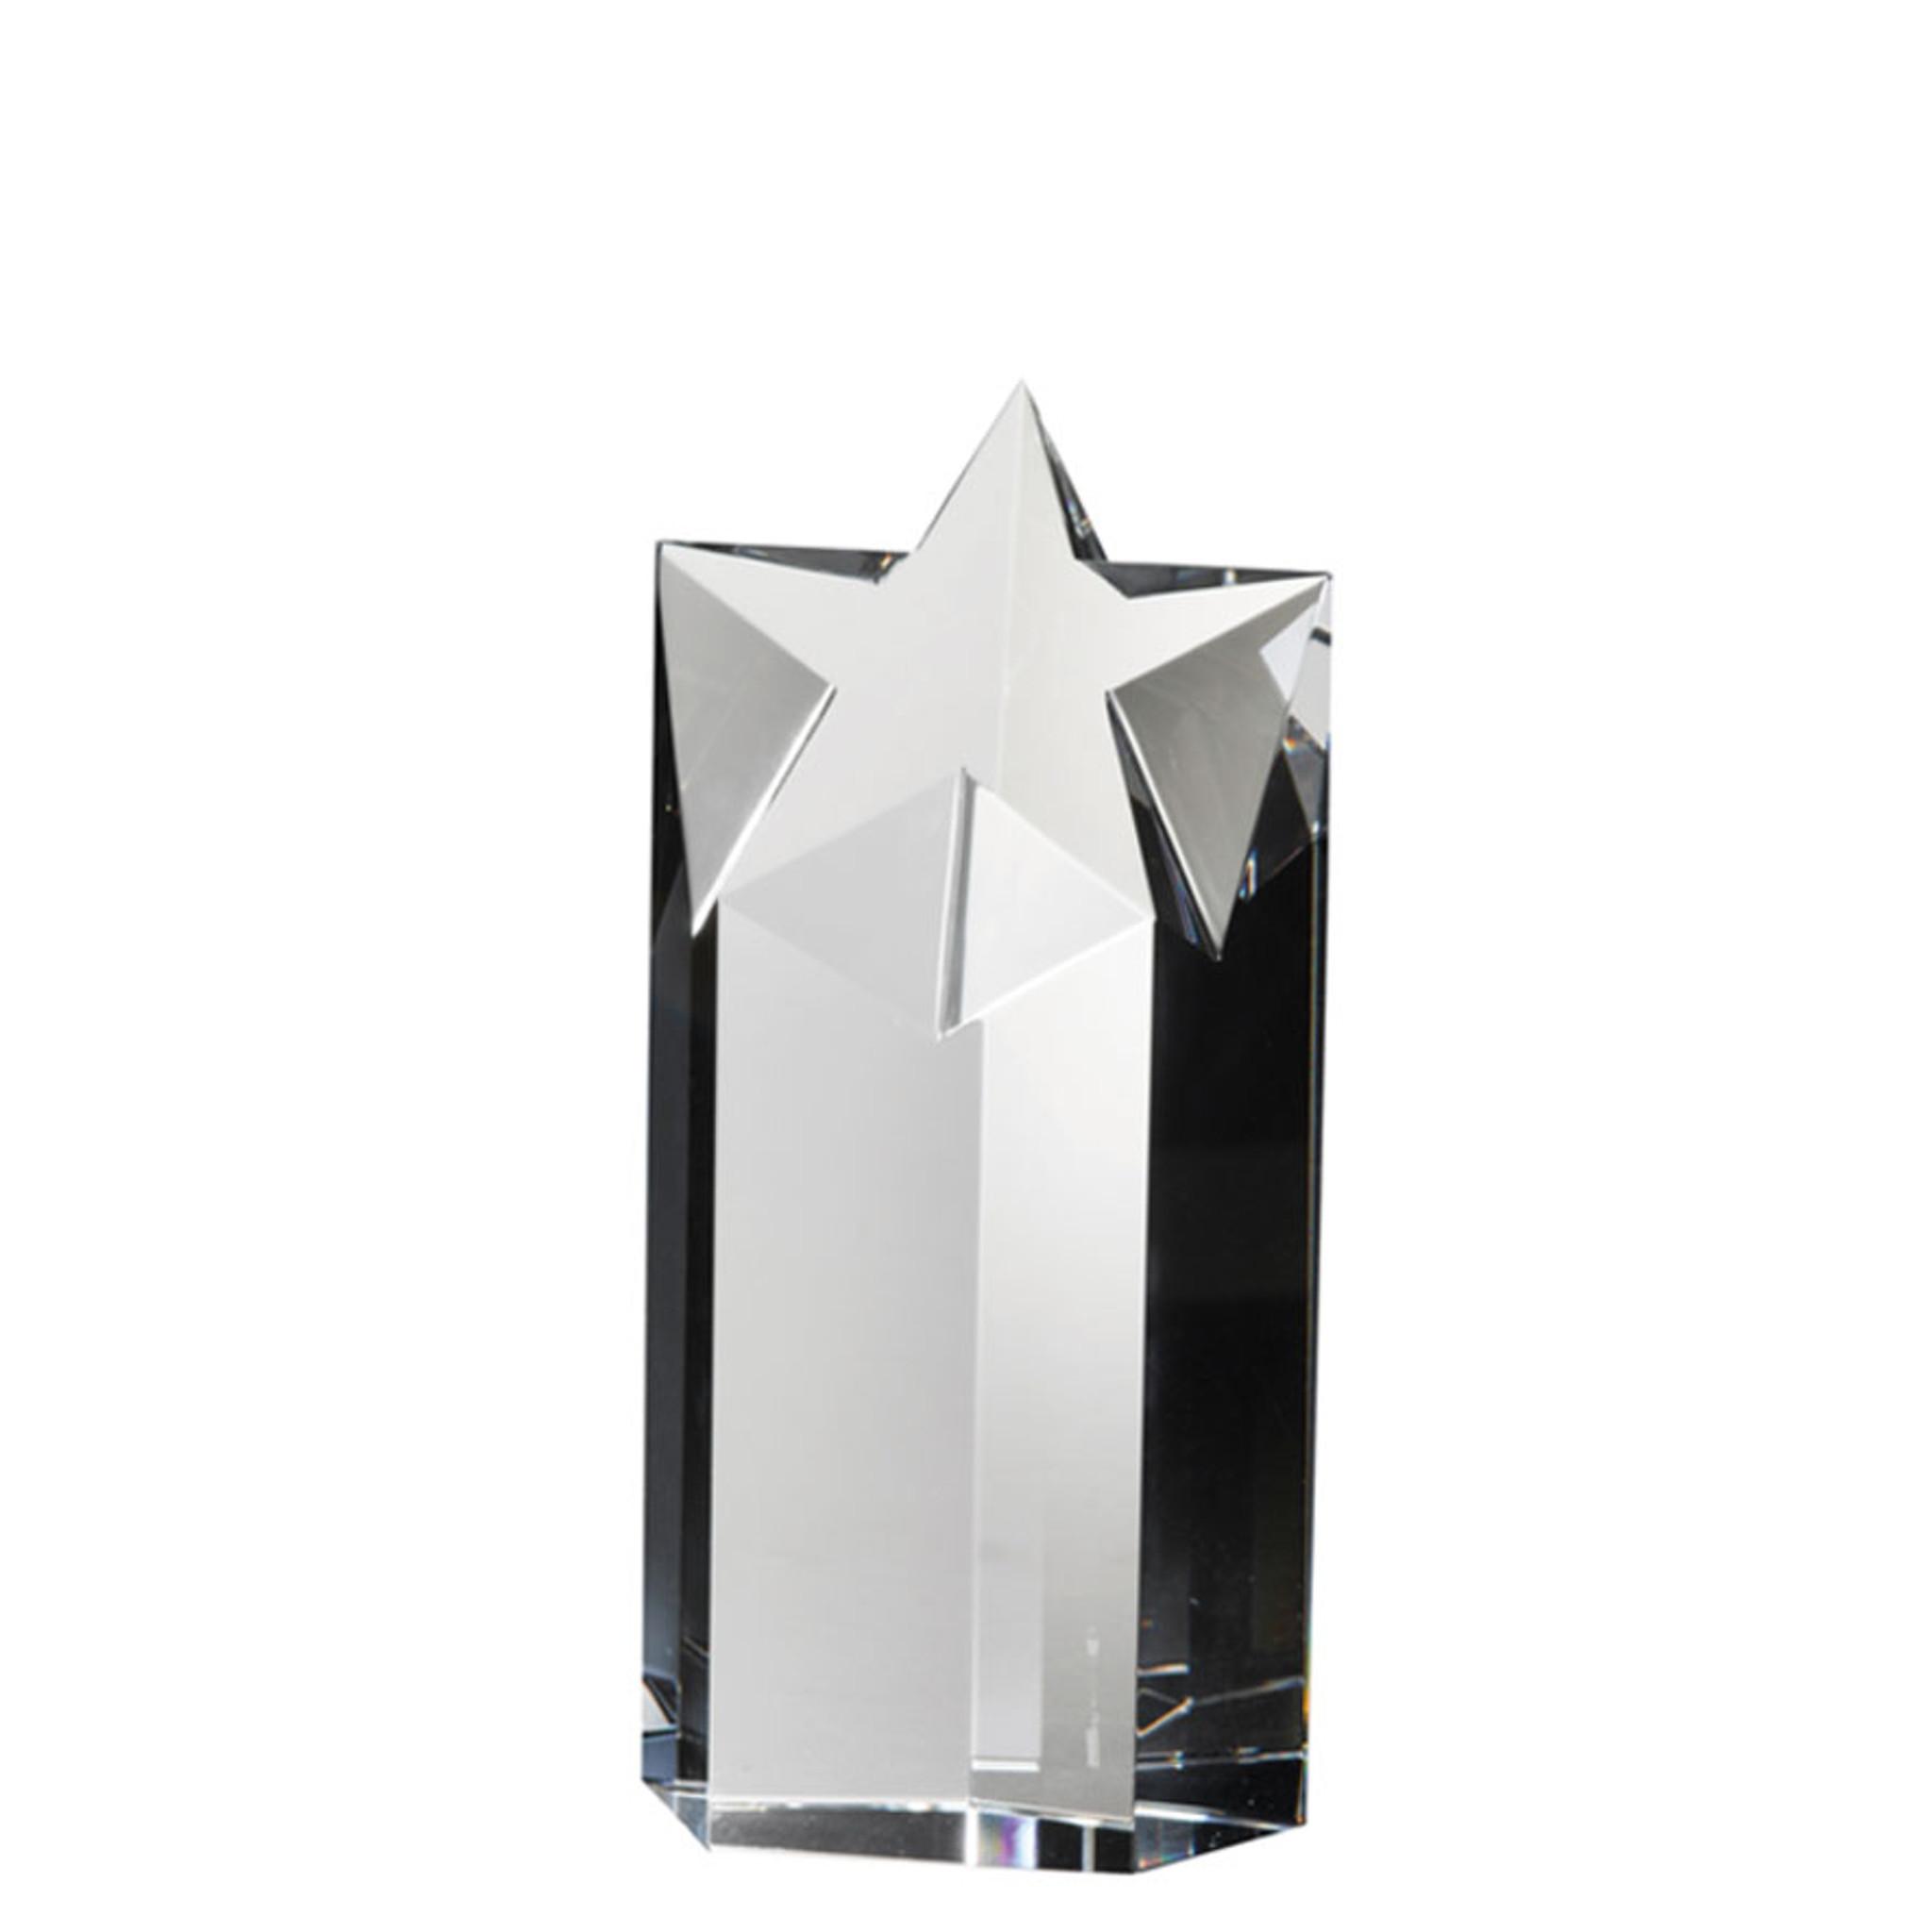 Orrefors Iconic Small Award